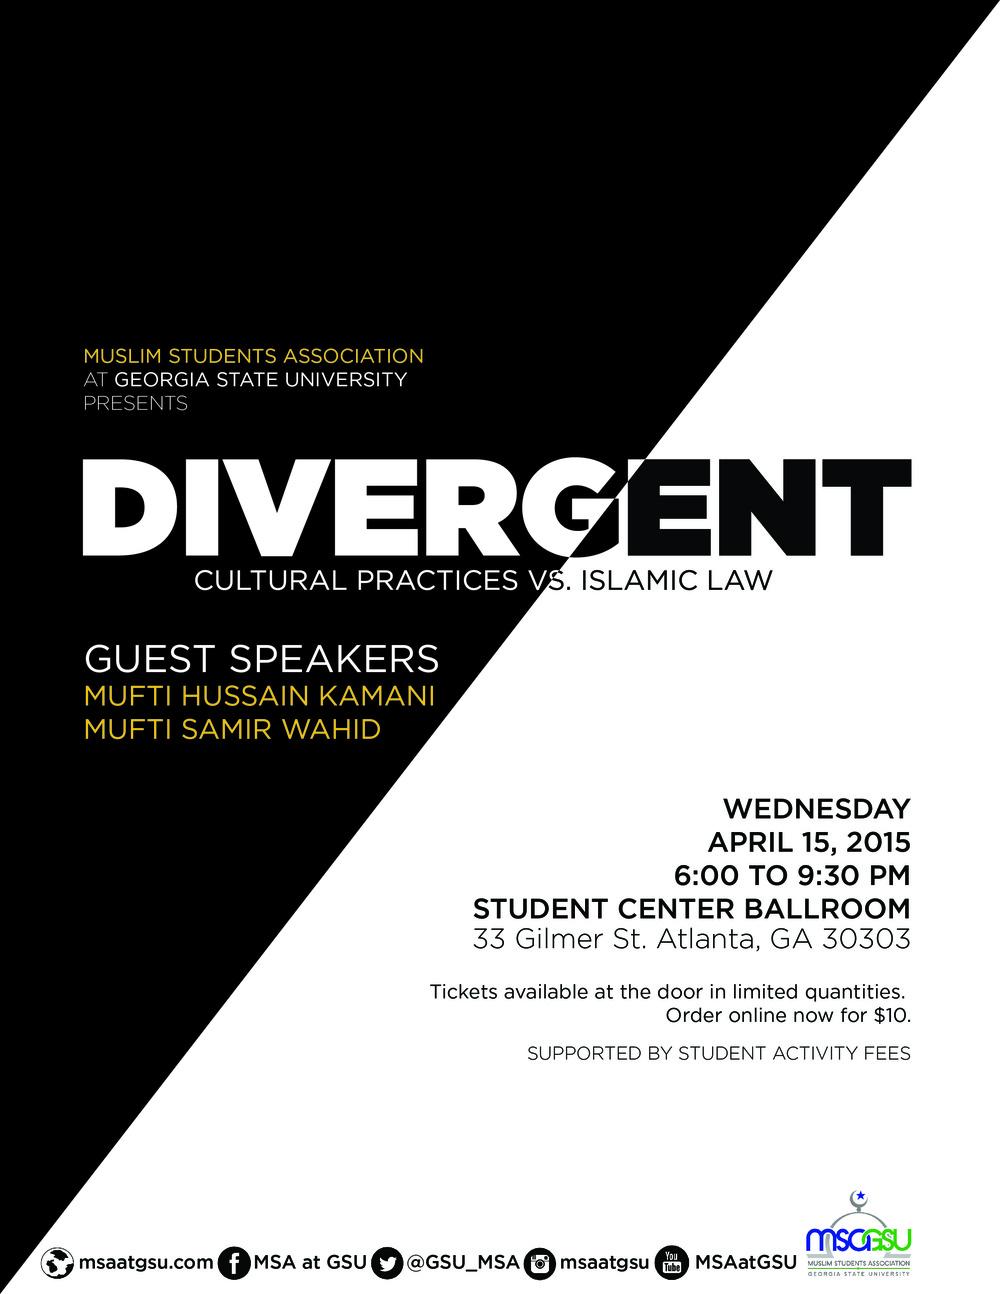 Divergent: Cultural Practices vs. Islamic Law